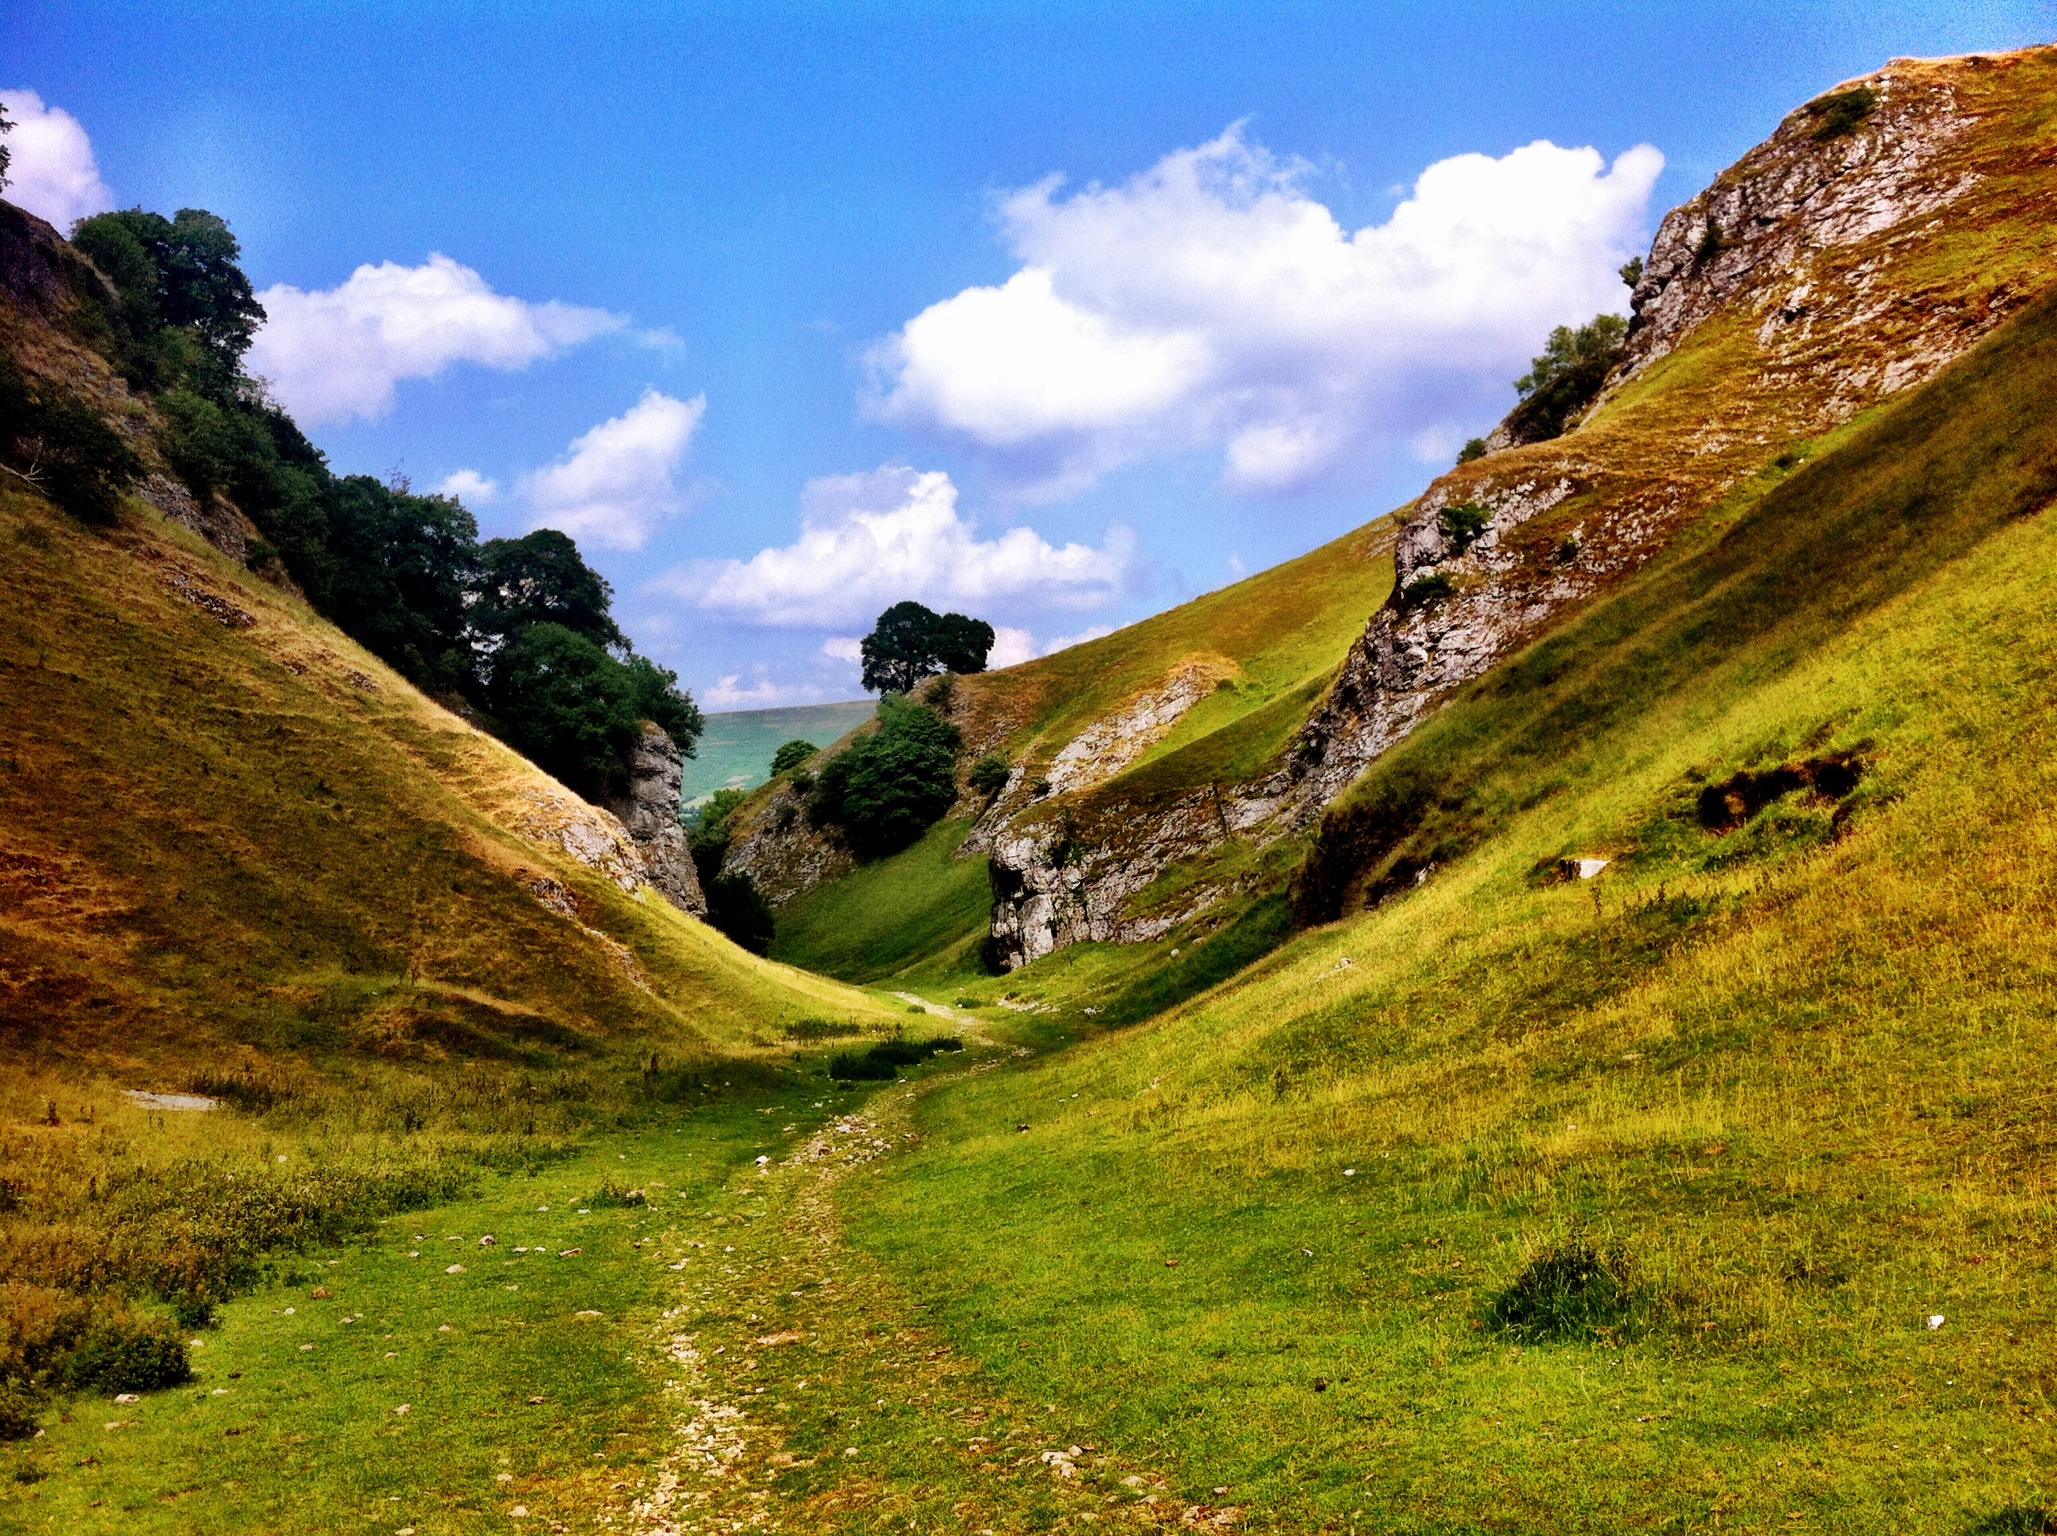 A Shorter Walk From Castleton – Cave Dale, The Winnats and Mam Tor Landslip